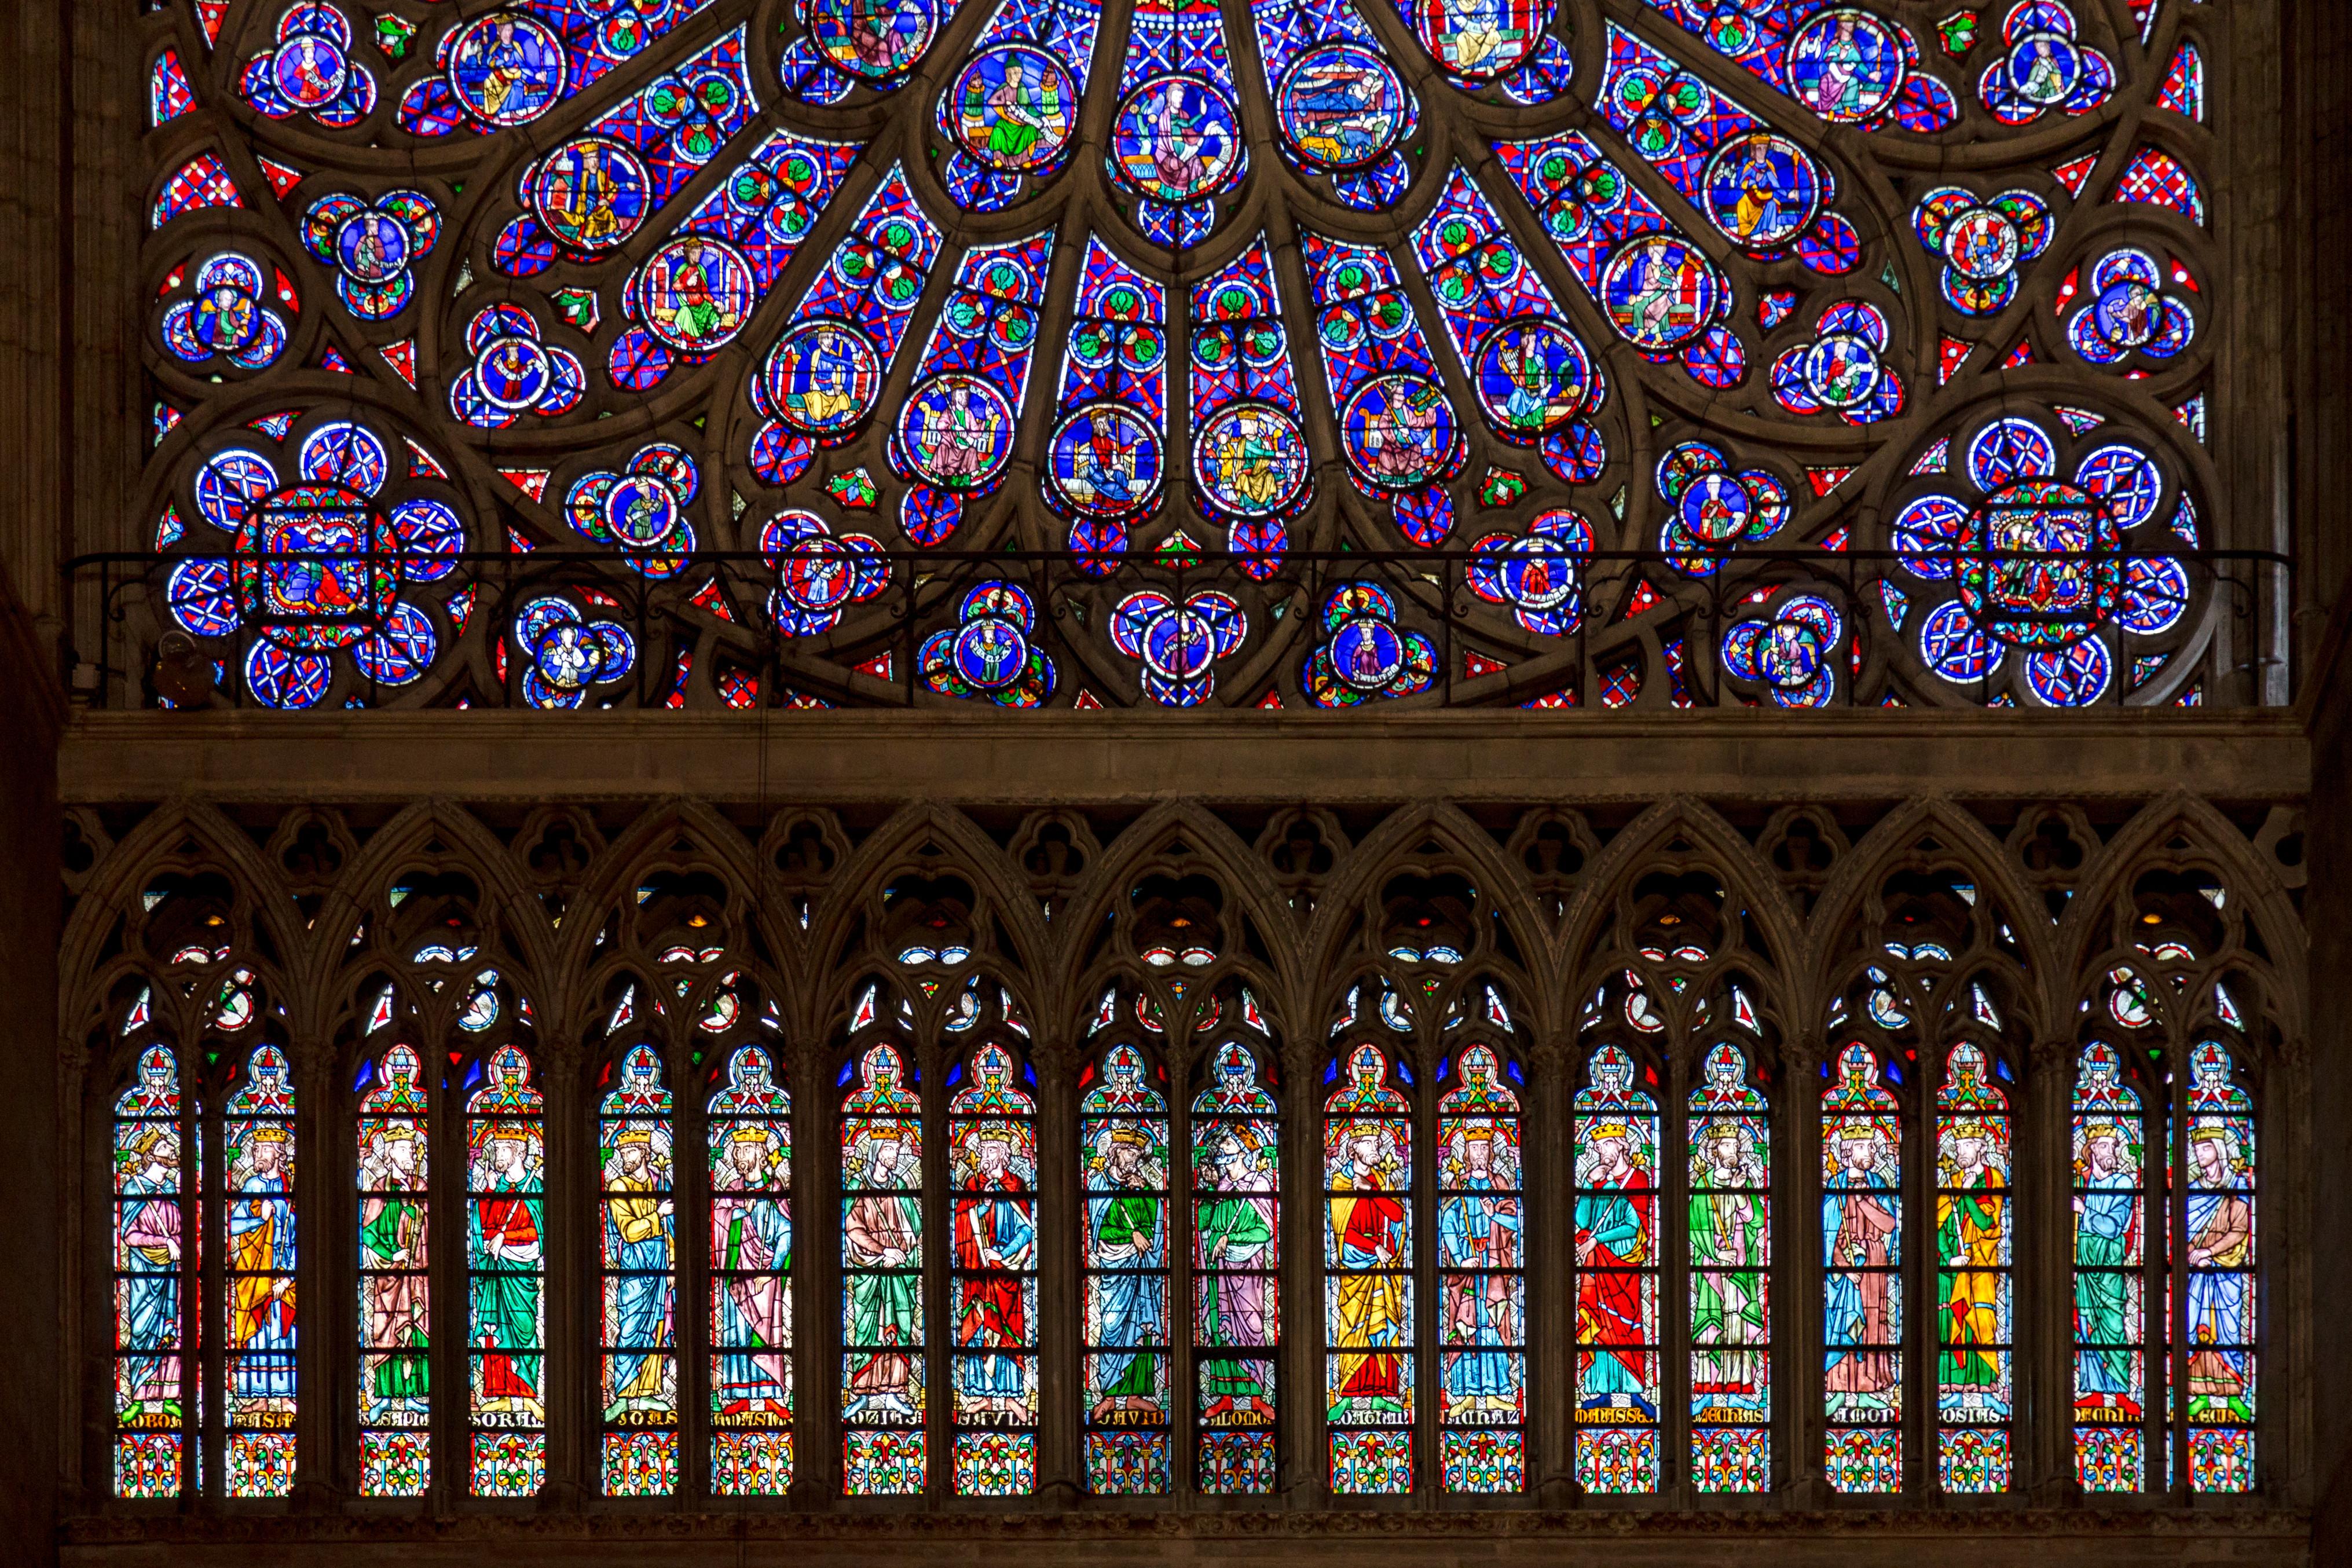 Antes do incêndio: a beleza da Catedral de Notre-Dame